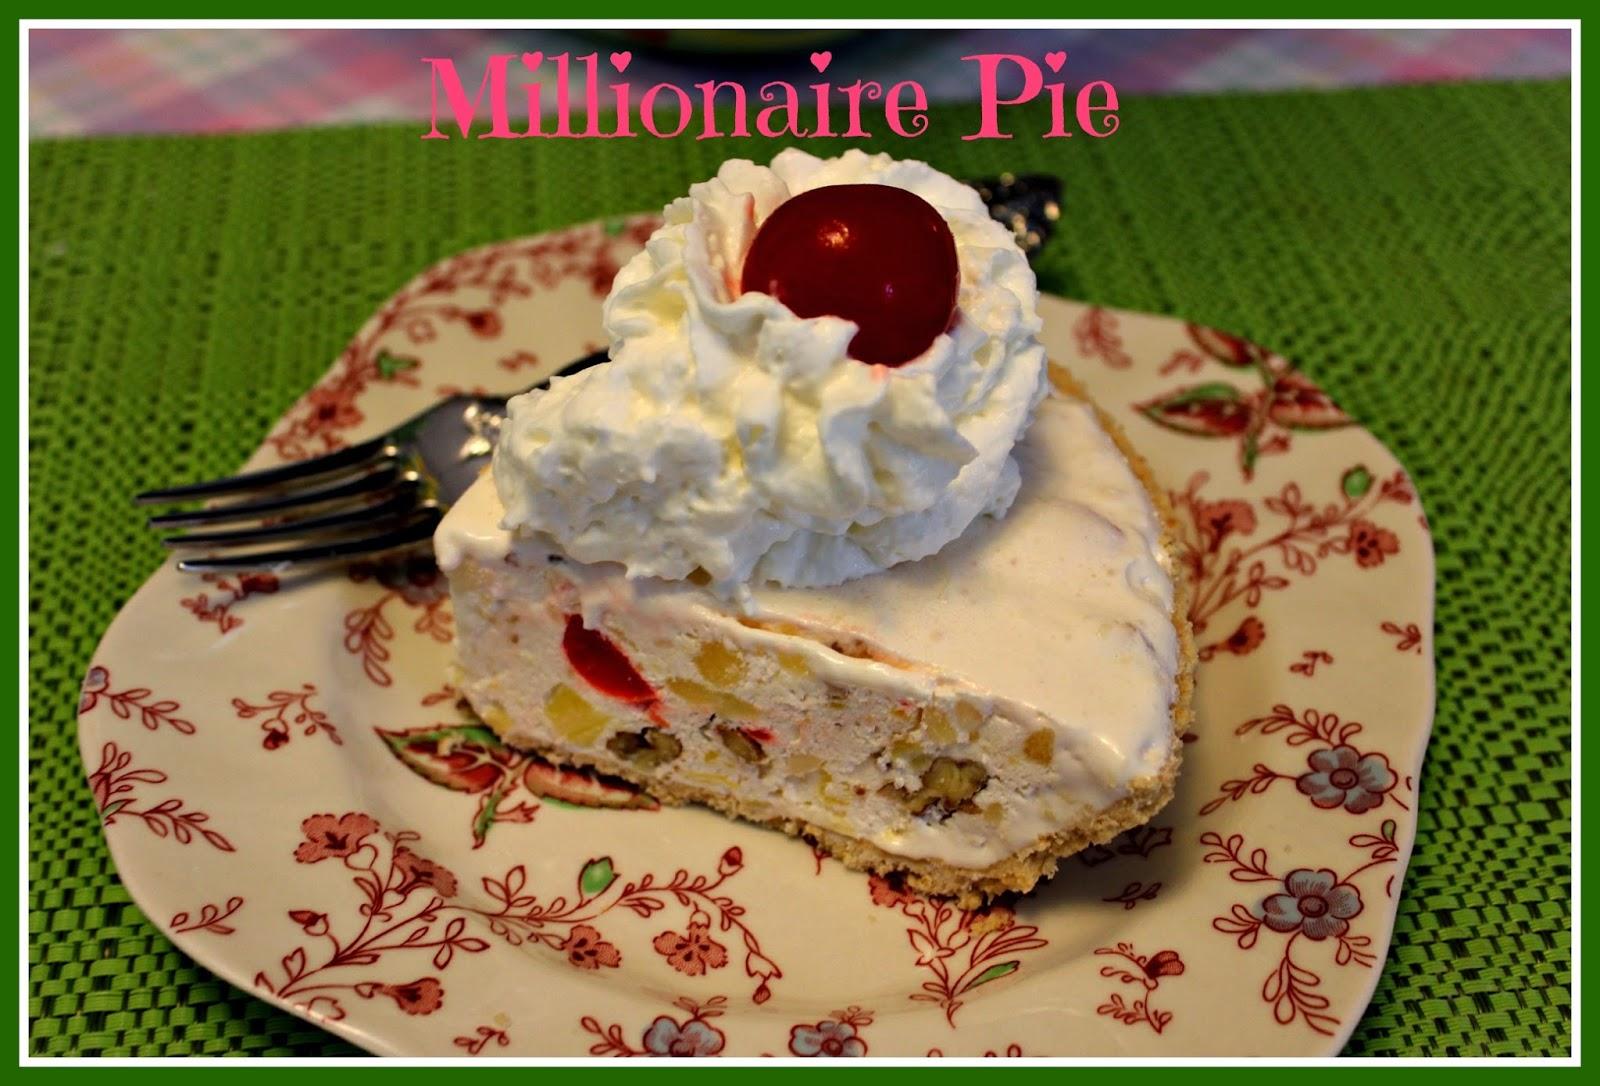 Millionaire Pie!